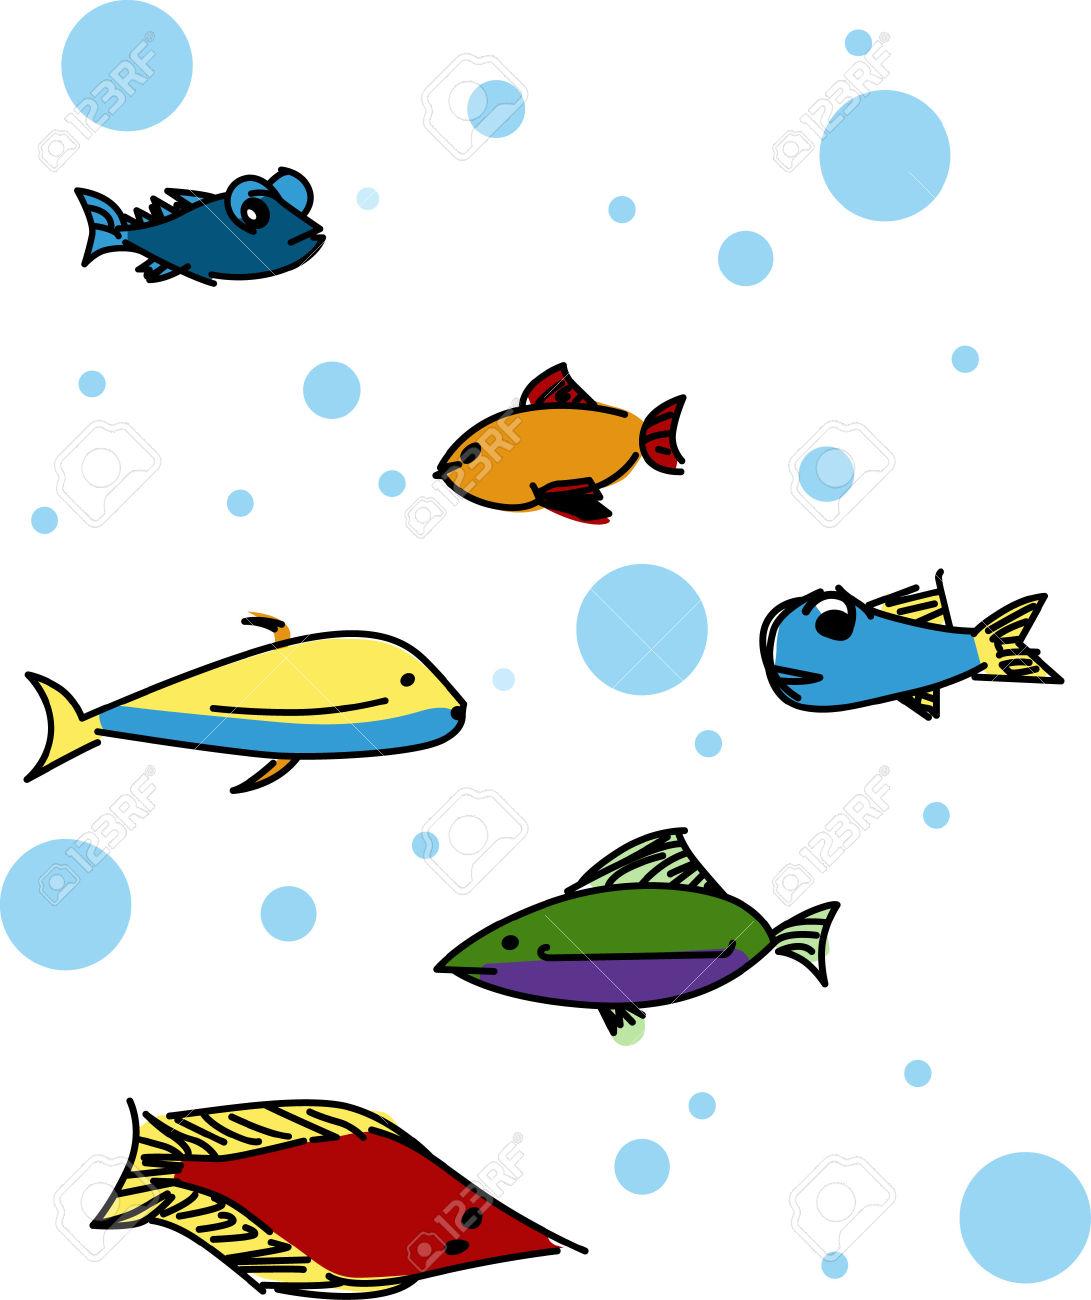 Marine Biology Is The Scientific Study Of Organisms In The Ocean.